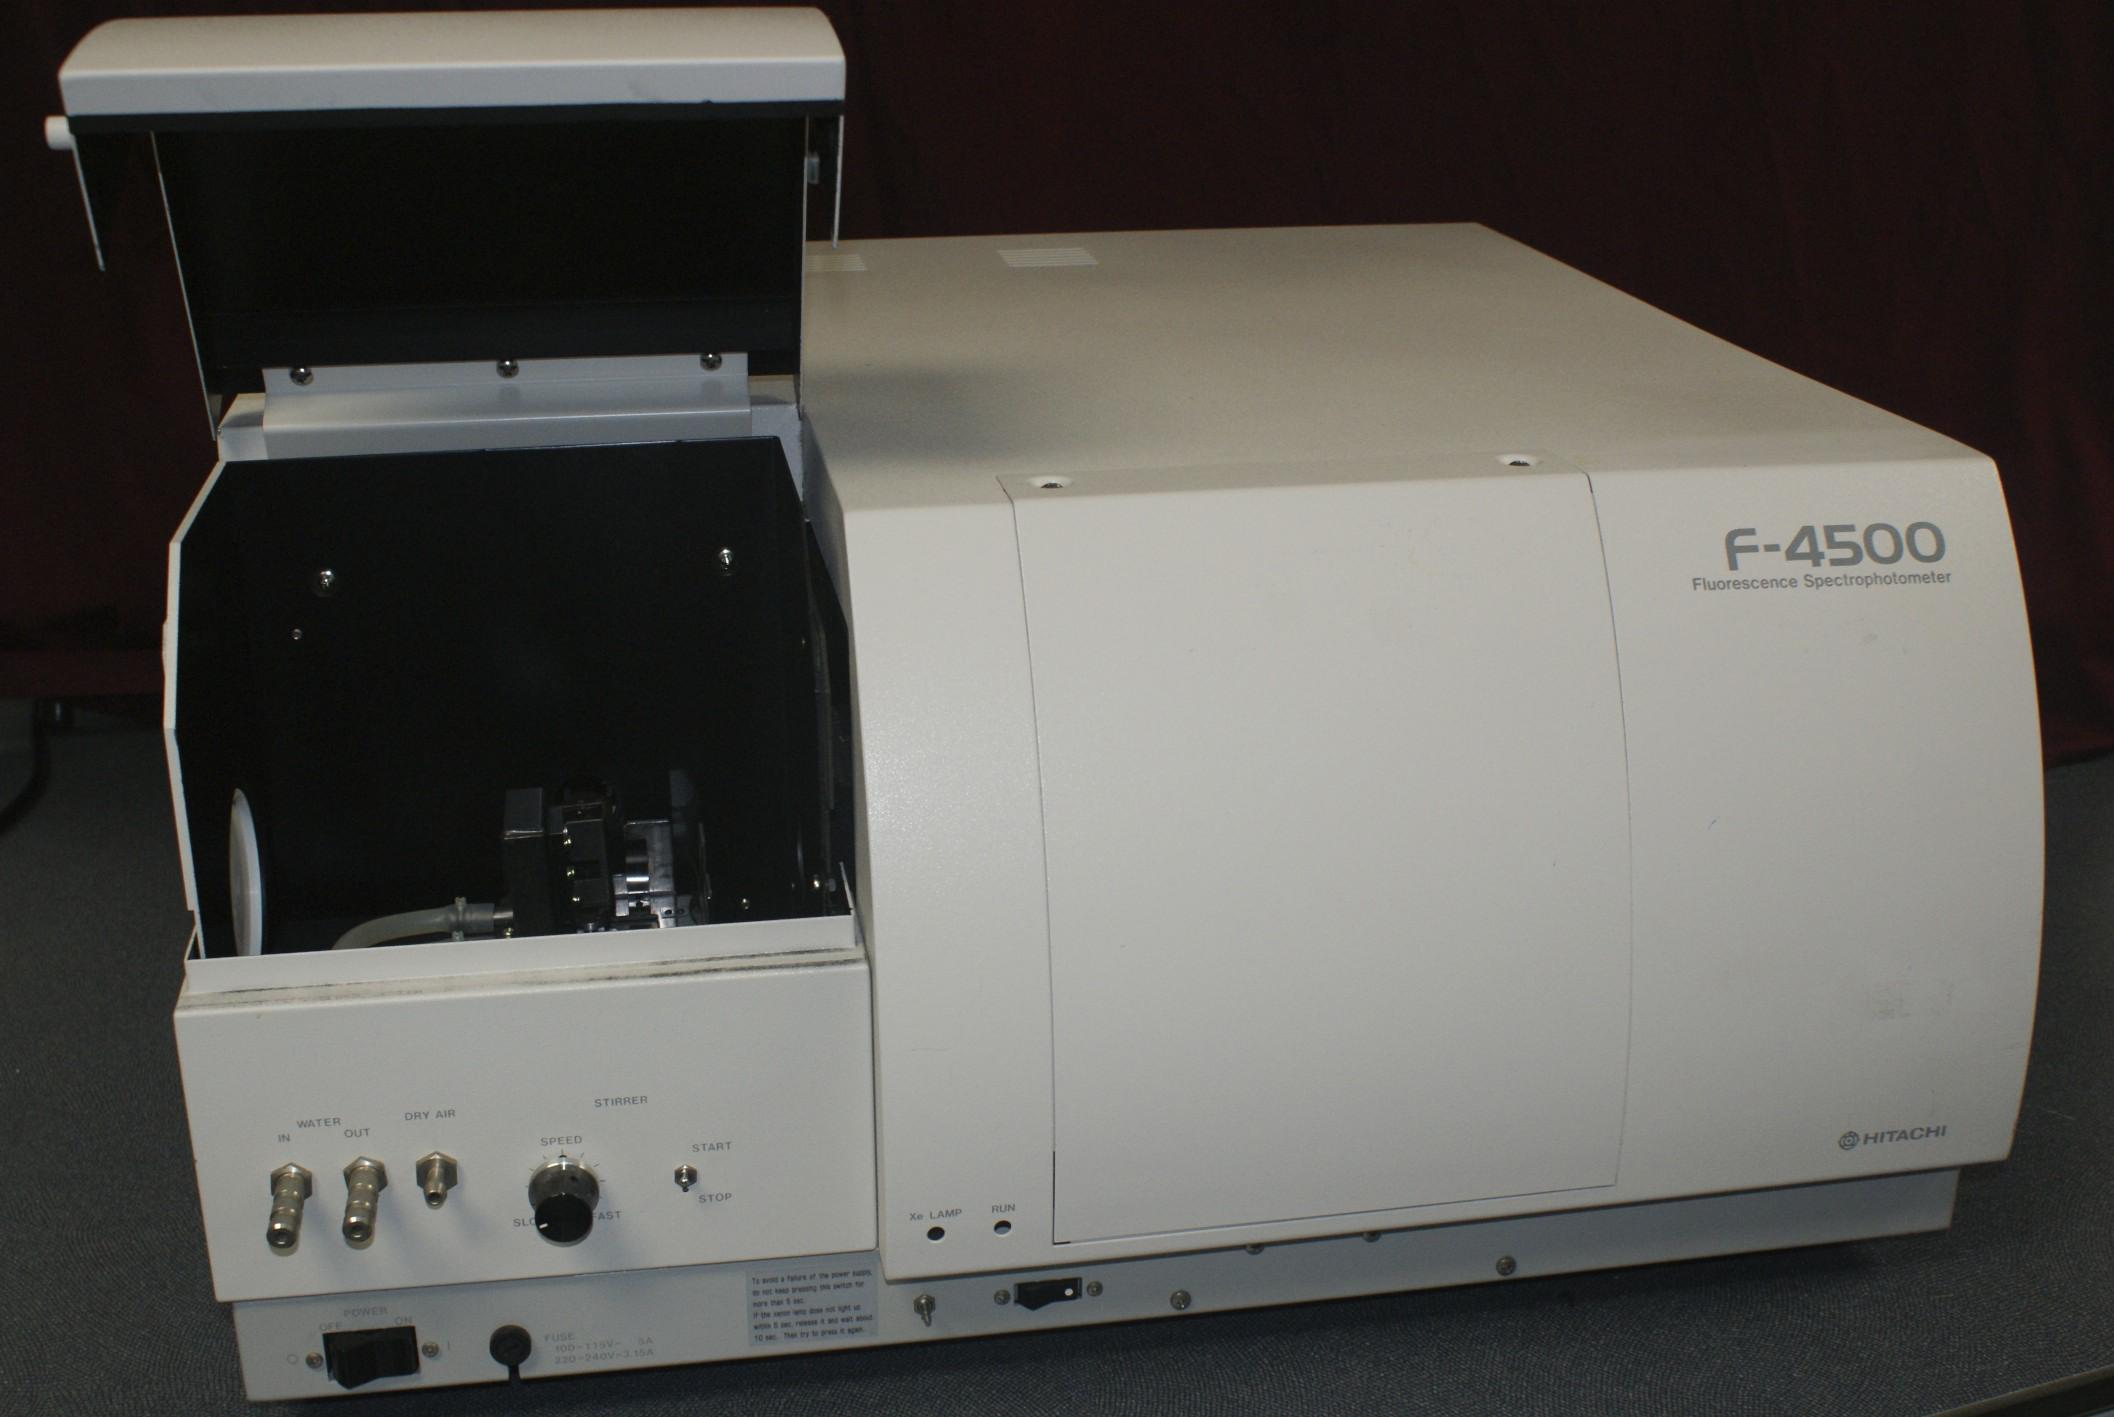 Hitachi F-4500 Fluorescence Spectrophotometer Hitachi F4500 Fluorescence Spectrometer with accessori